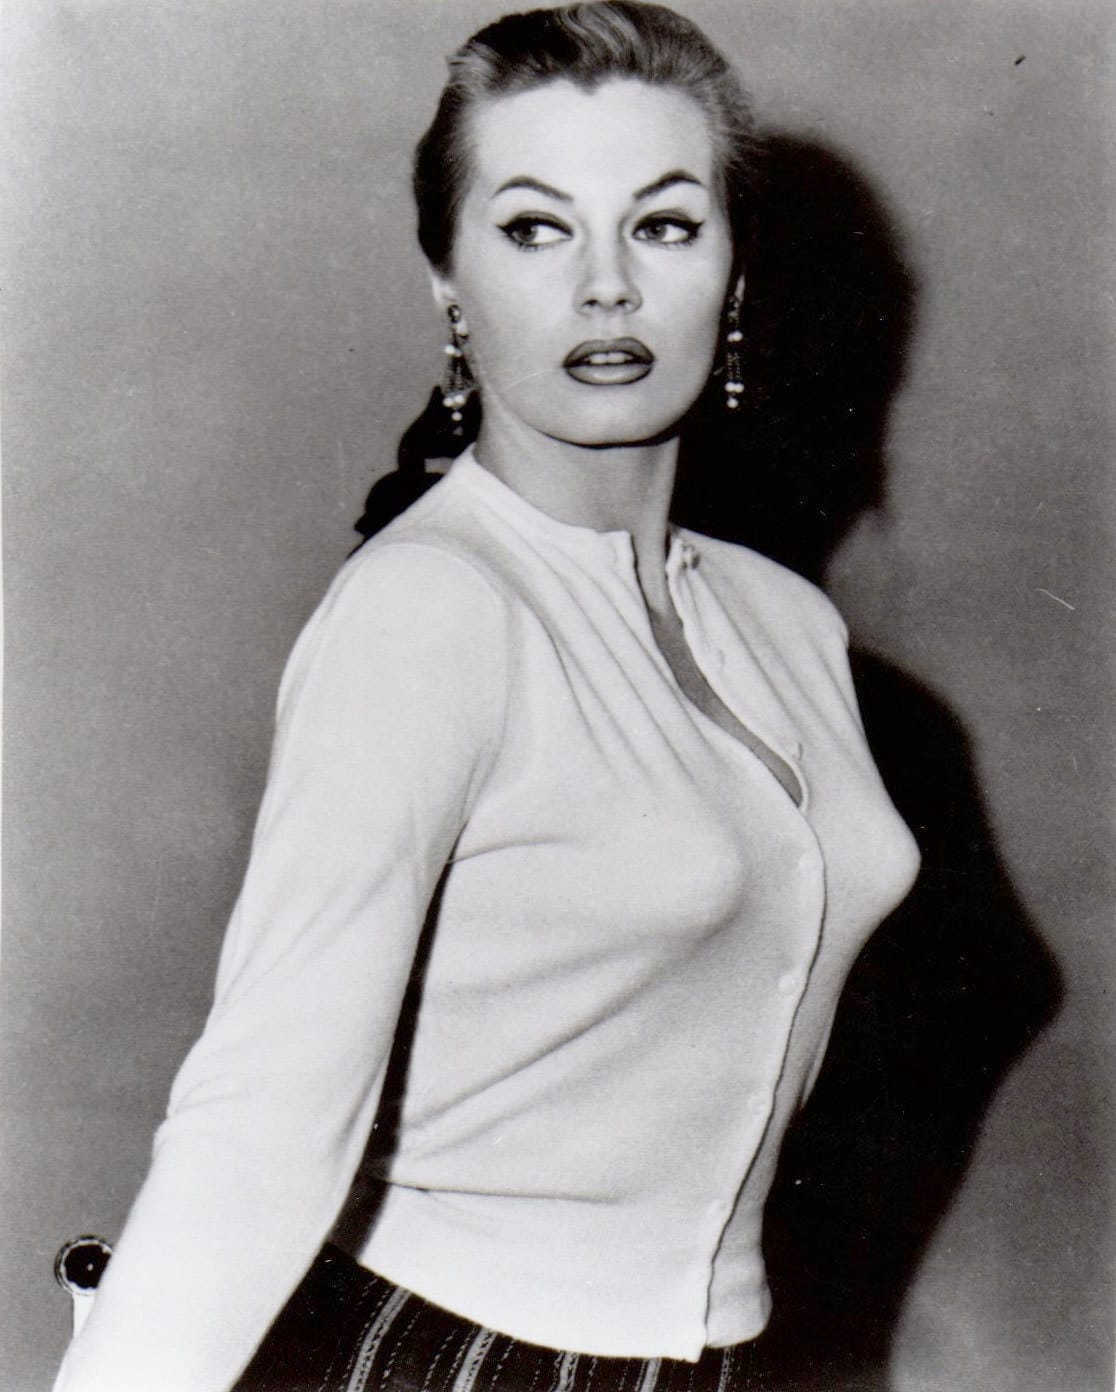 Picture of Anita Ekberg